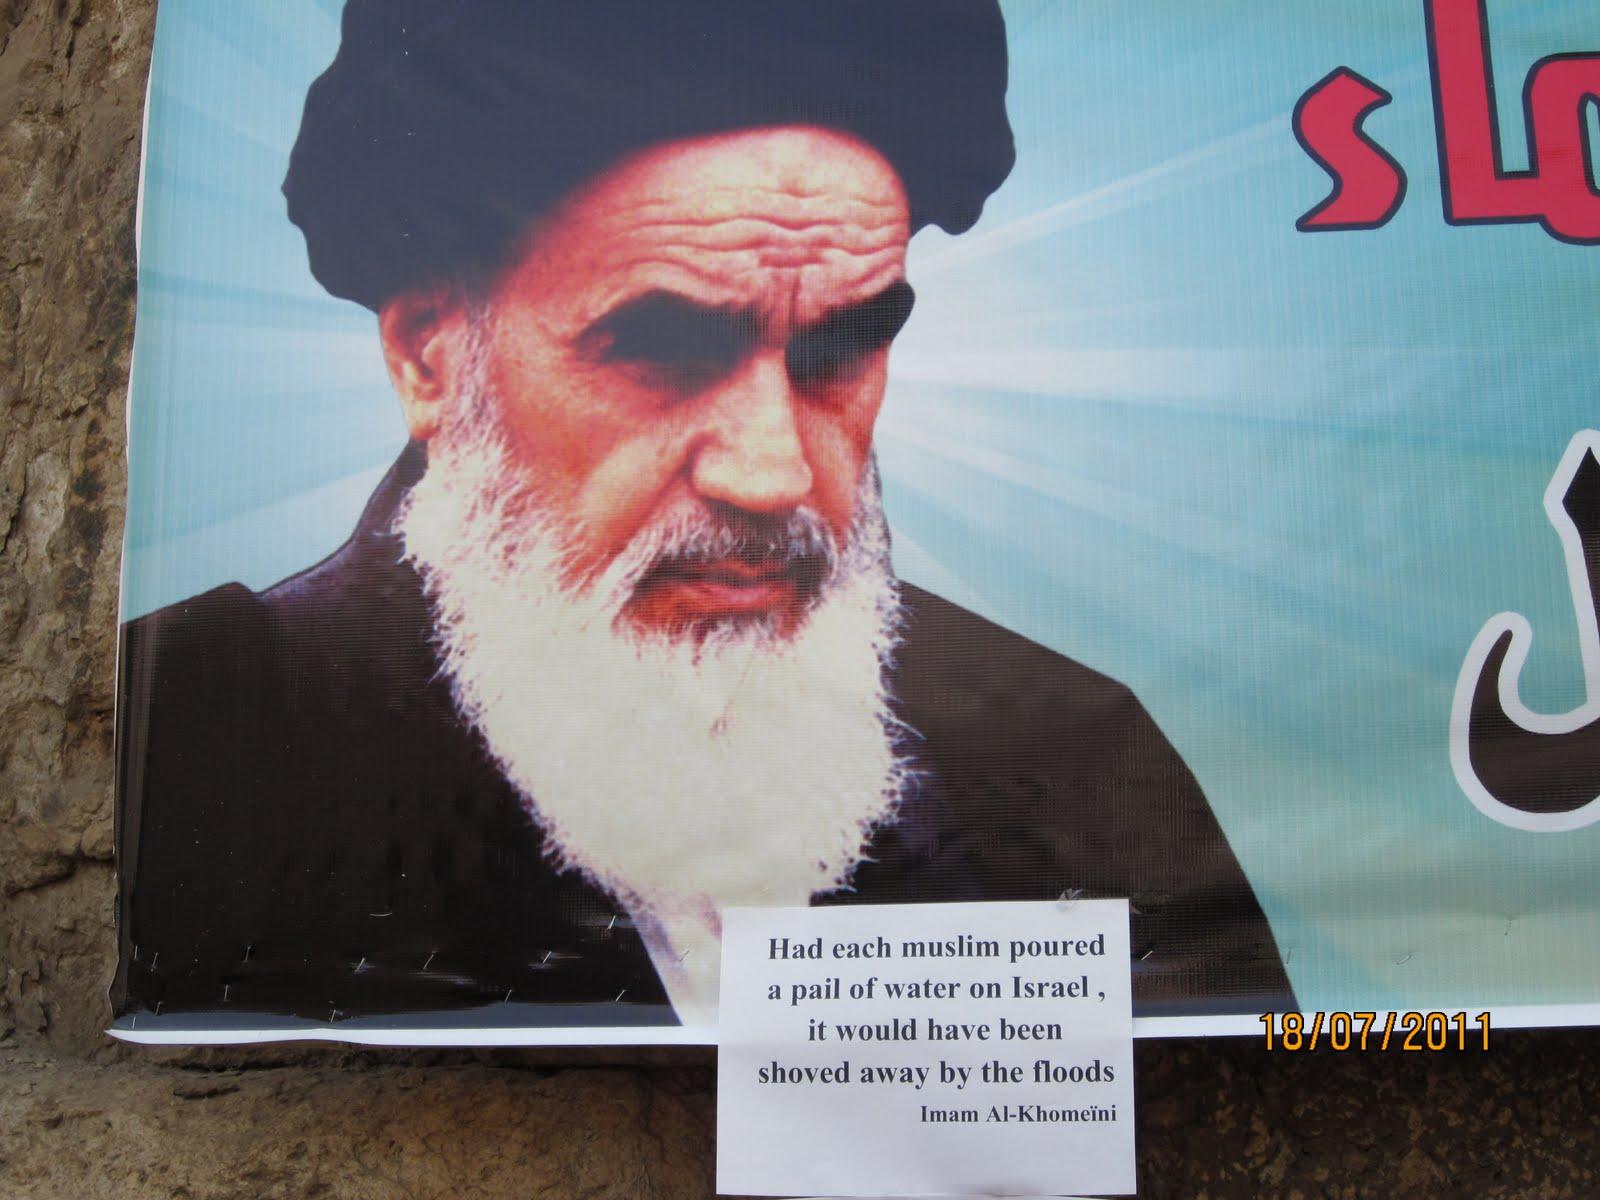 ayatollah khomeini the hizballah and lebanon conflict Hizballah of lebanon: extremist ideals vs mundane politics  of ayatollah ruhollah khomeini, hizballah has  of the conflict within lebanon.